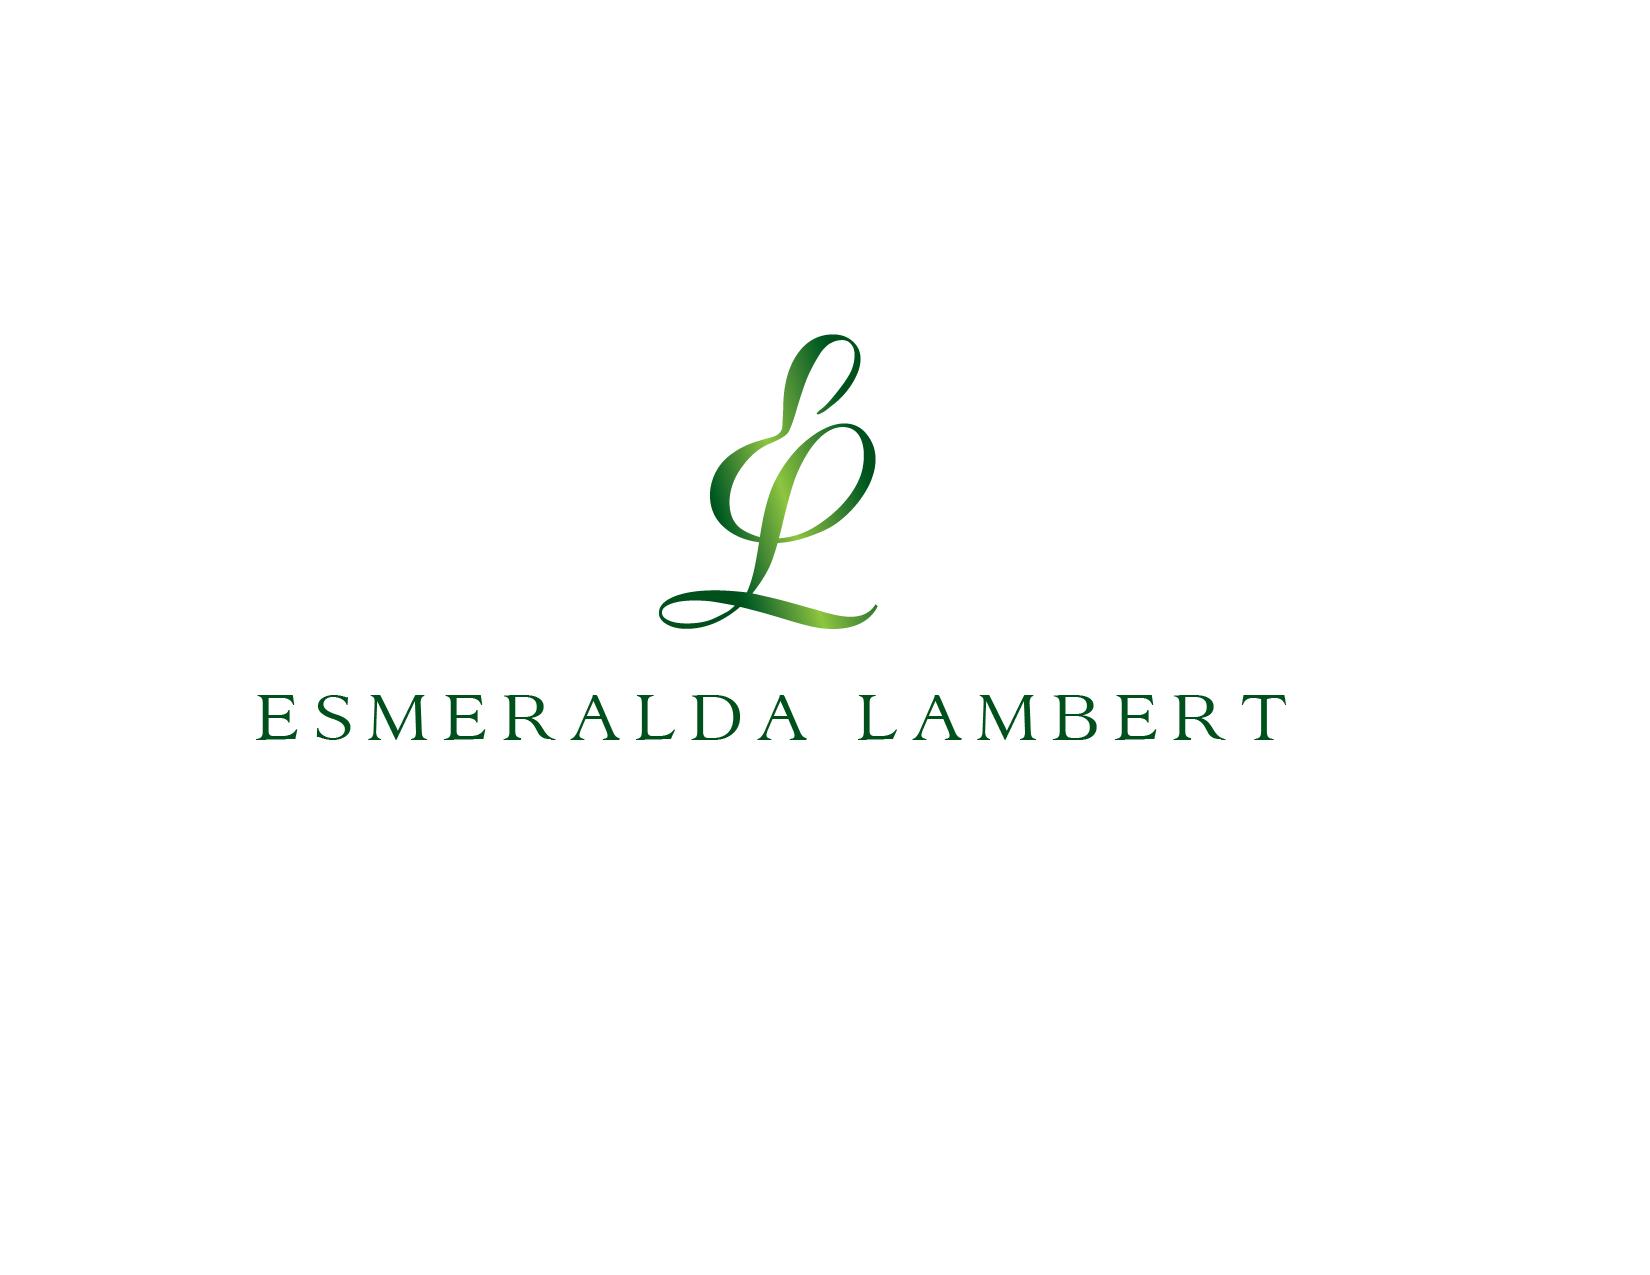 New logo wanted for Esmeralda Lambert